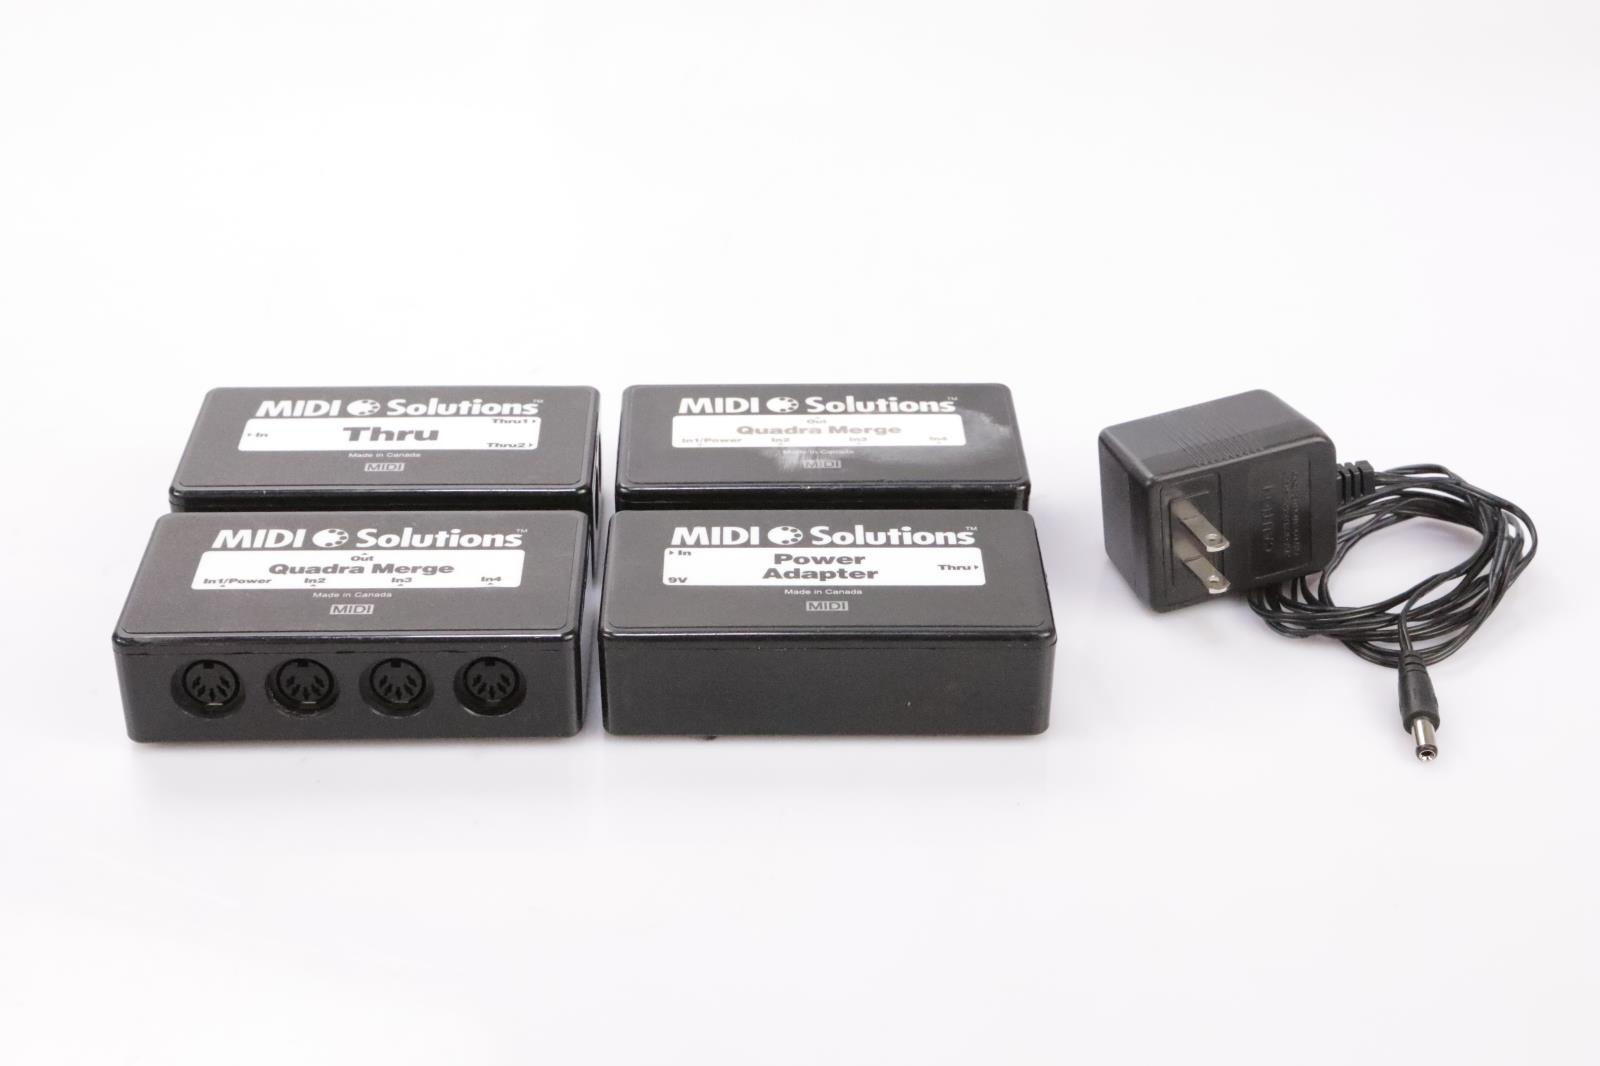 4 MIDI Solutions Quadra Merge Thru Power Adapter Interface Boxes #34685